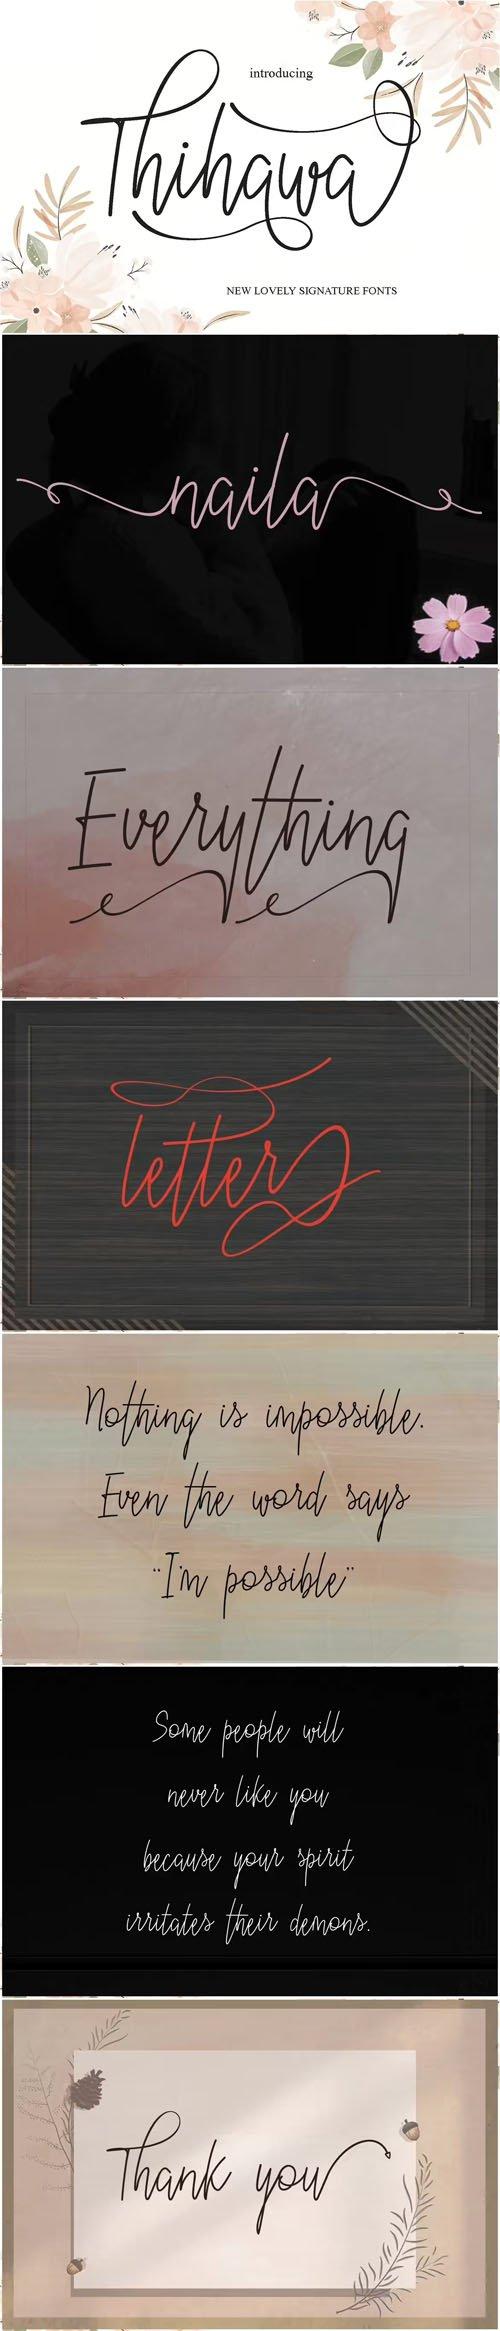 Thihawa Script - New Lovely Signature Font